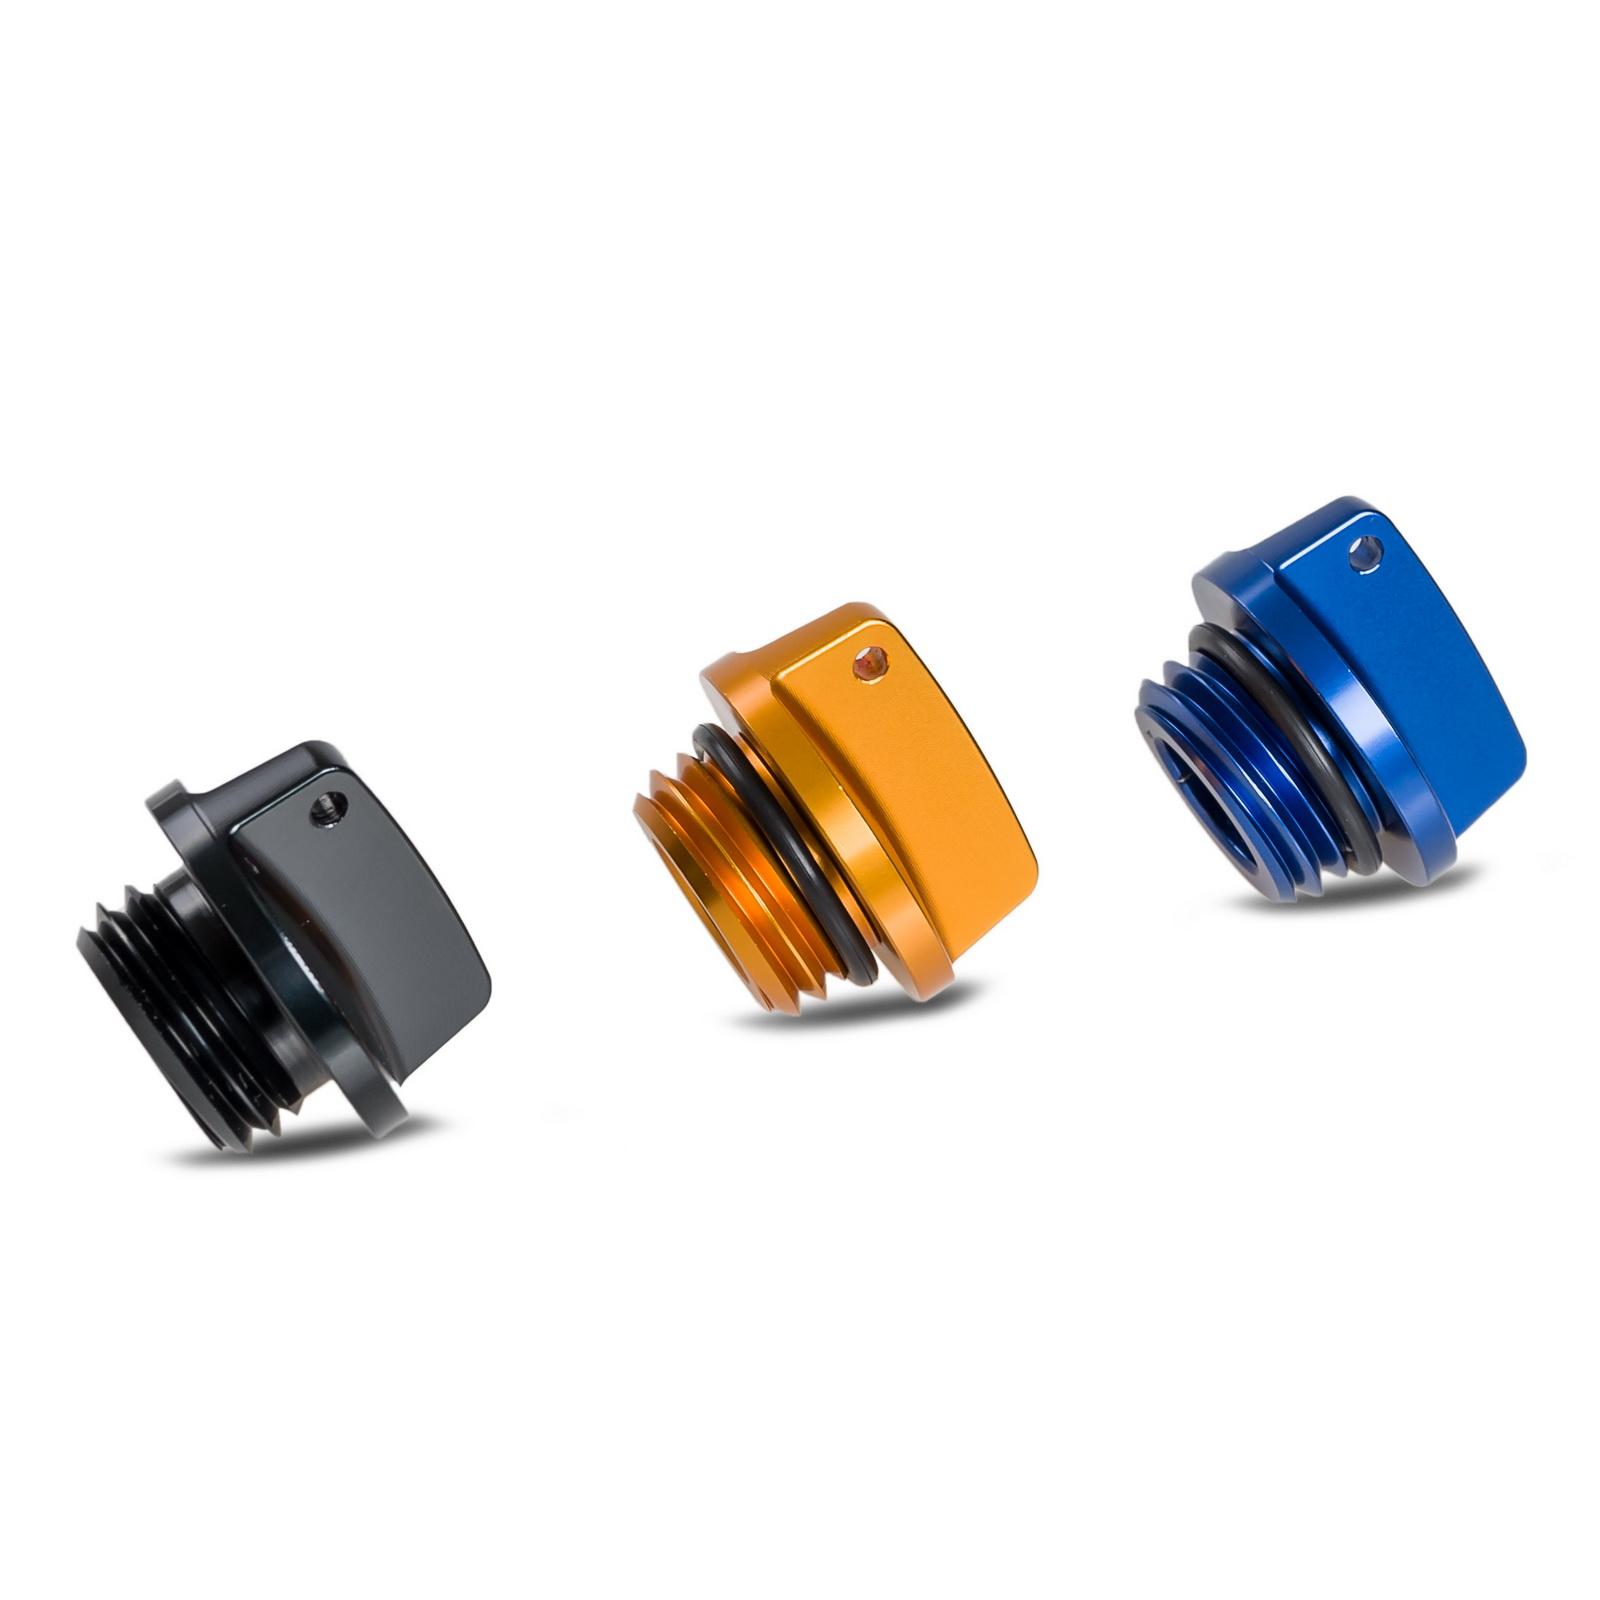 Motorcycles Supplies Oil Filler Cap Plug For font b Yamaha b font FZ1 FZ6 R FZ07